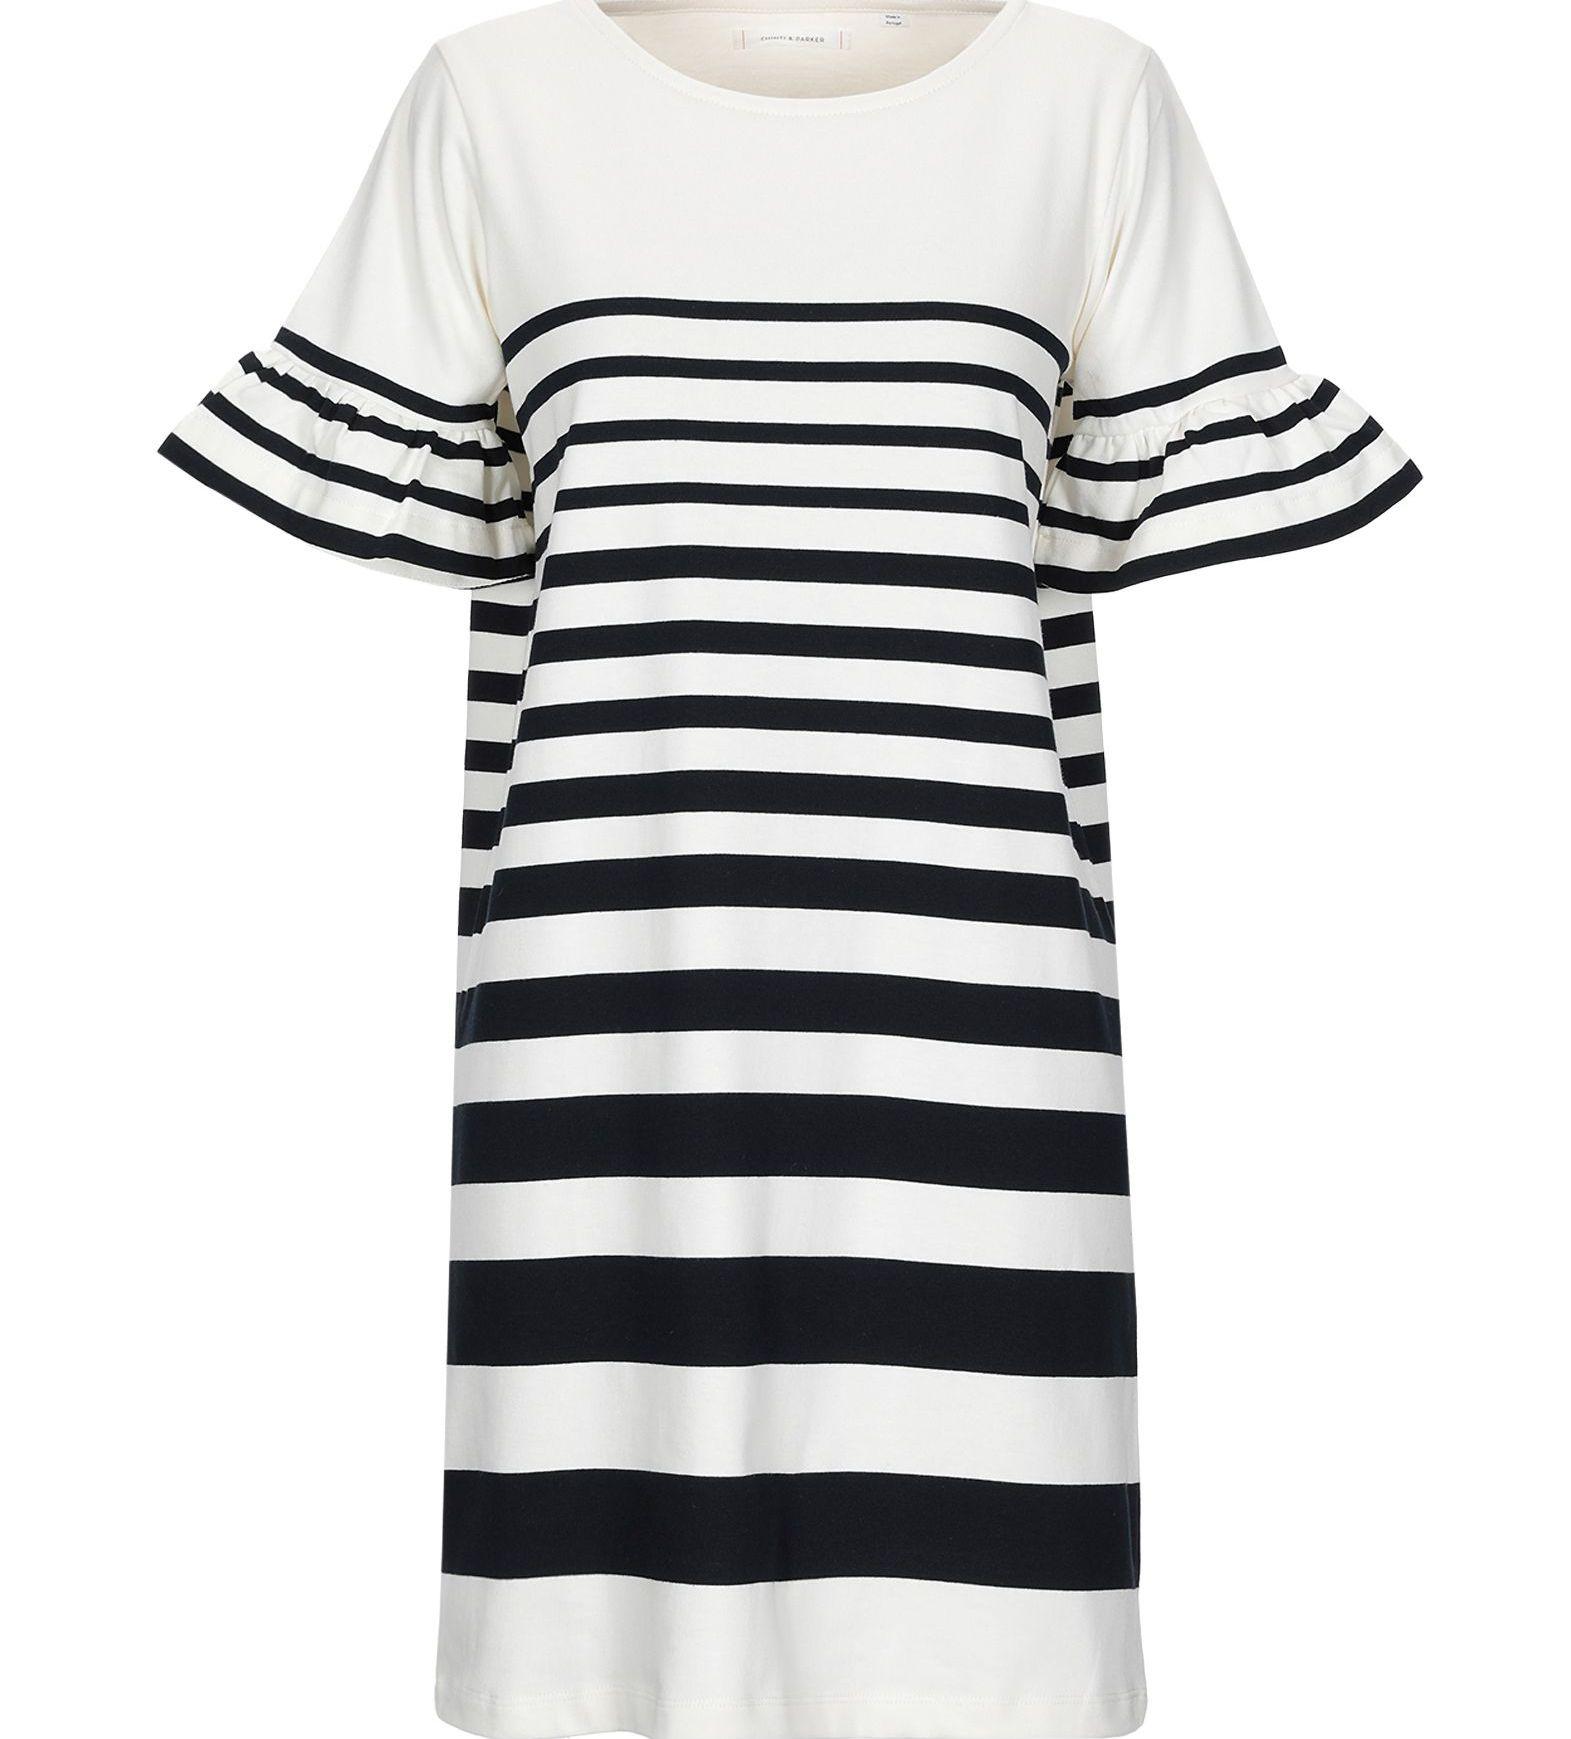 CHINTI AND PARKER ΦΟΡΕΜΑΤΑ Κοντό φόρεμα